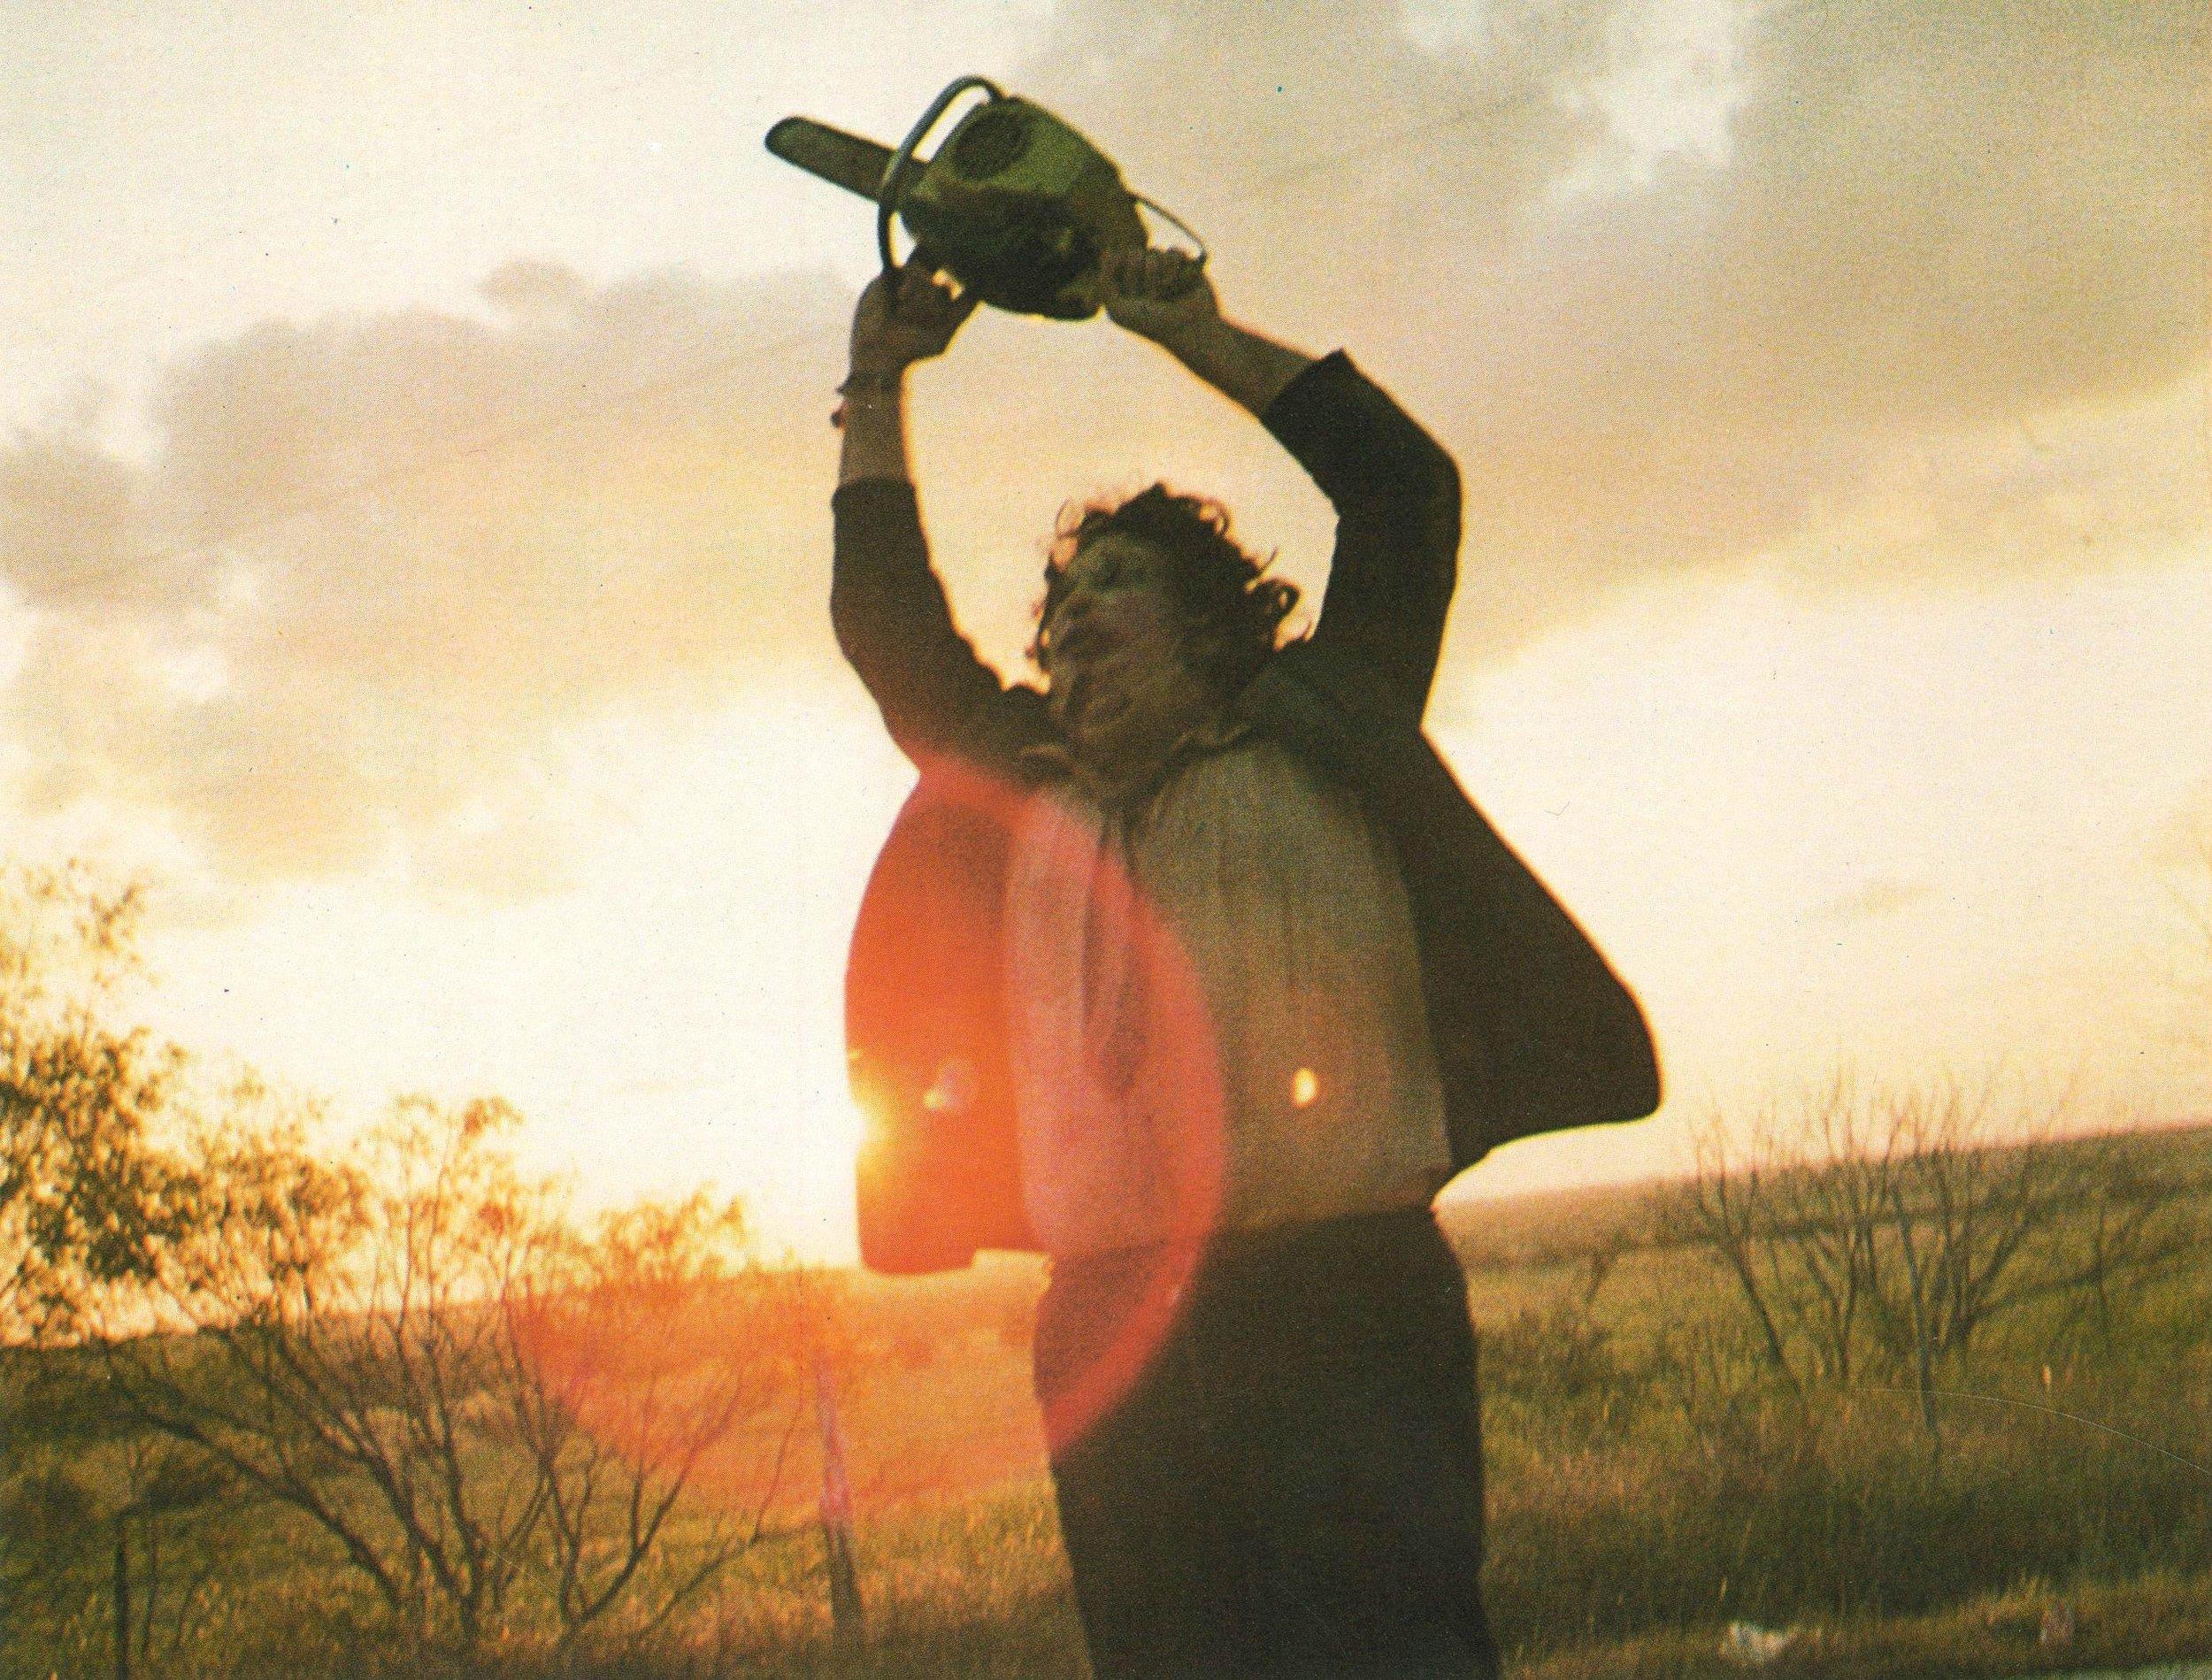 The Texas Chainsaw Massacre Still